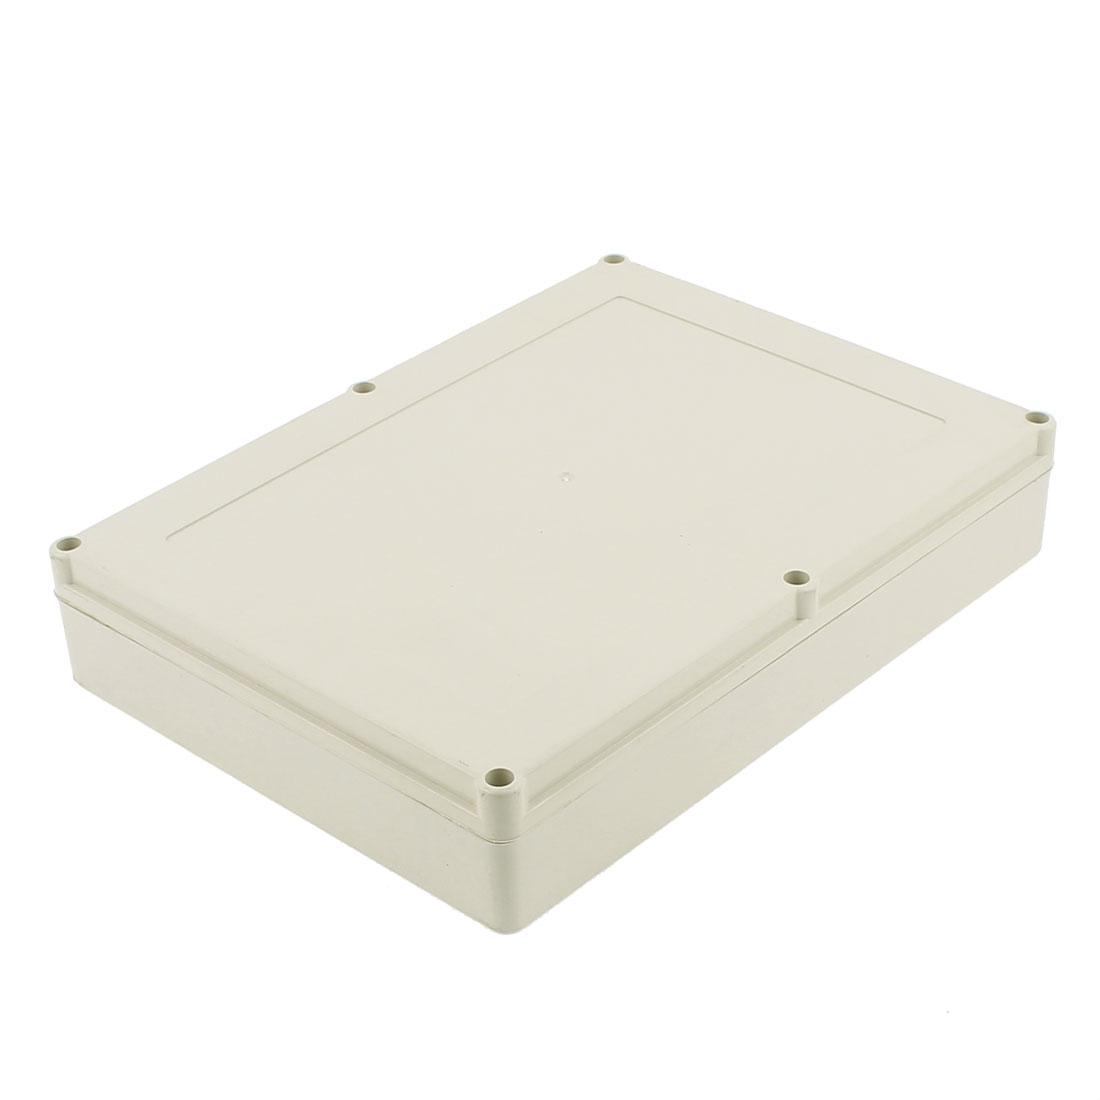 295 x 155 x 72mm Dustproof IP65 Junction Box Terminal Connecting Box Enclosure